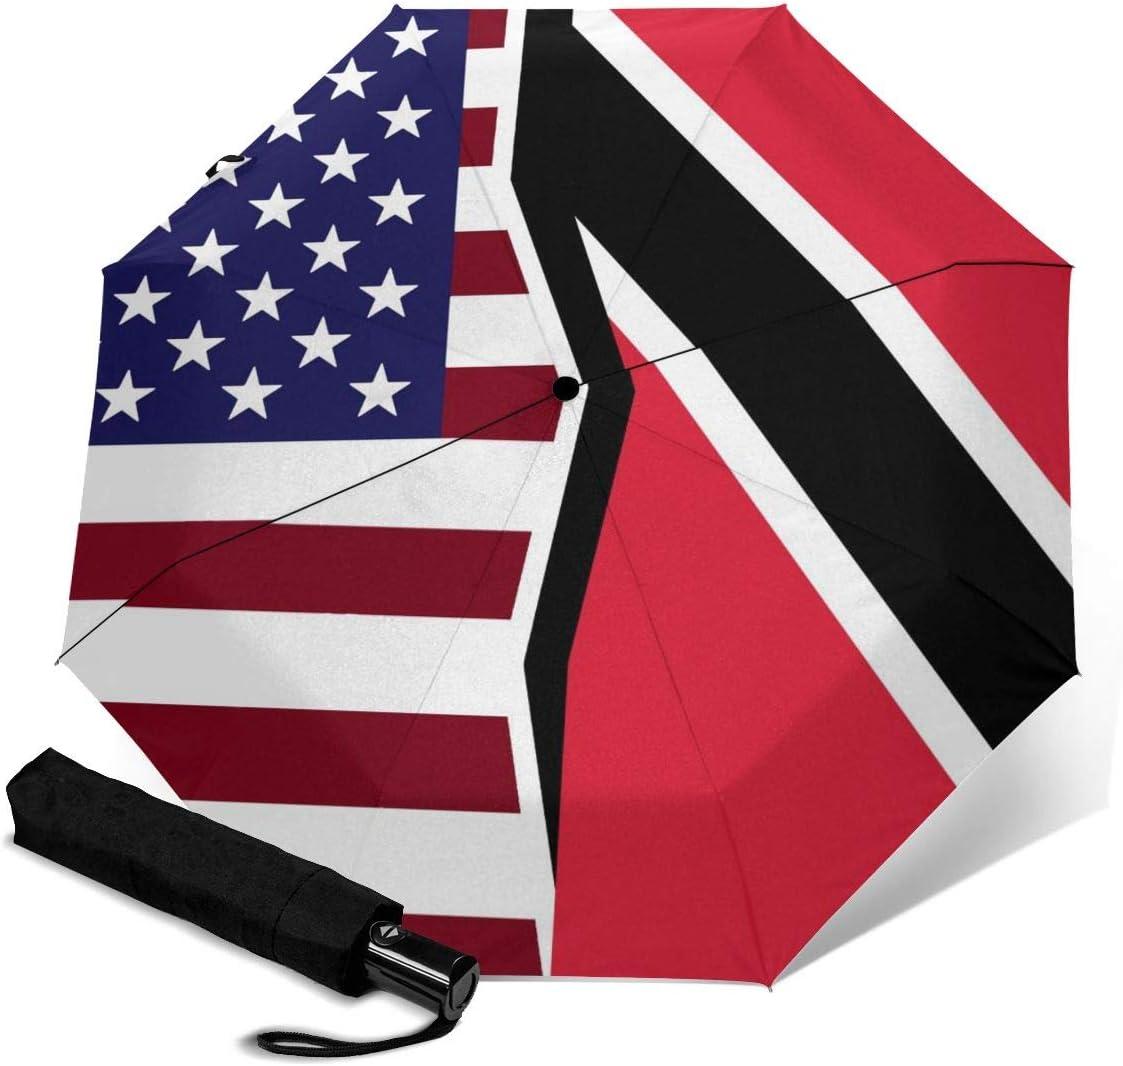 American And Trinidad Tobago Flag Automatic Folding Umbrella Super Sunscreen Rain Portable Creative UV Protection Tri-Fold Umbrella